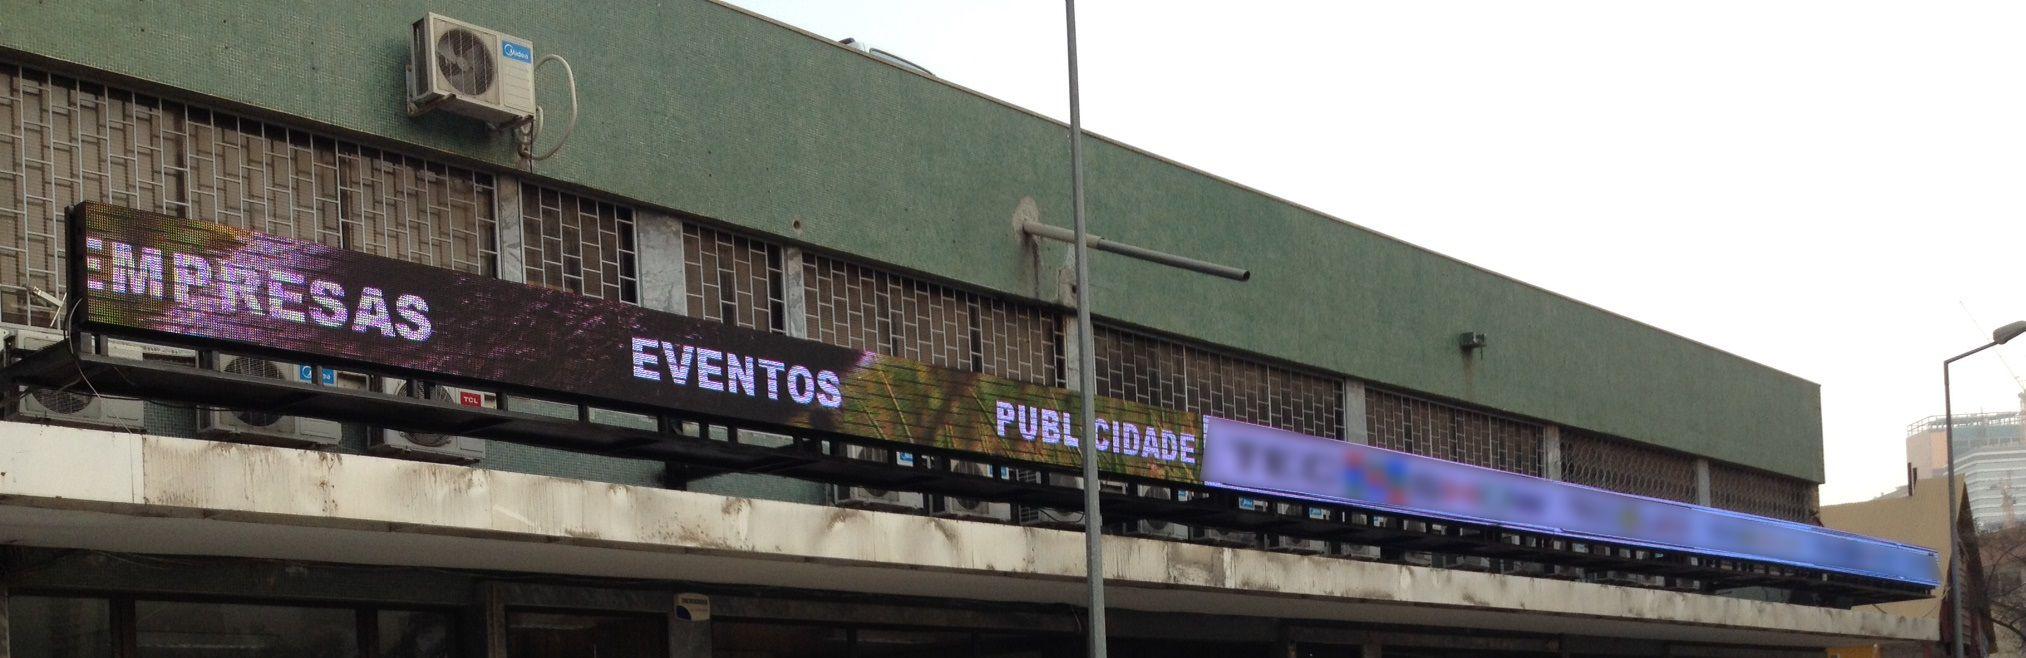 Ecrã LED – Luanda